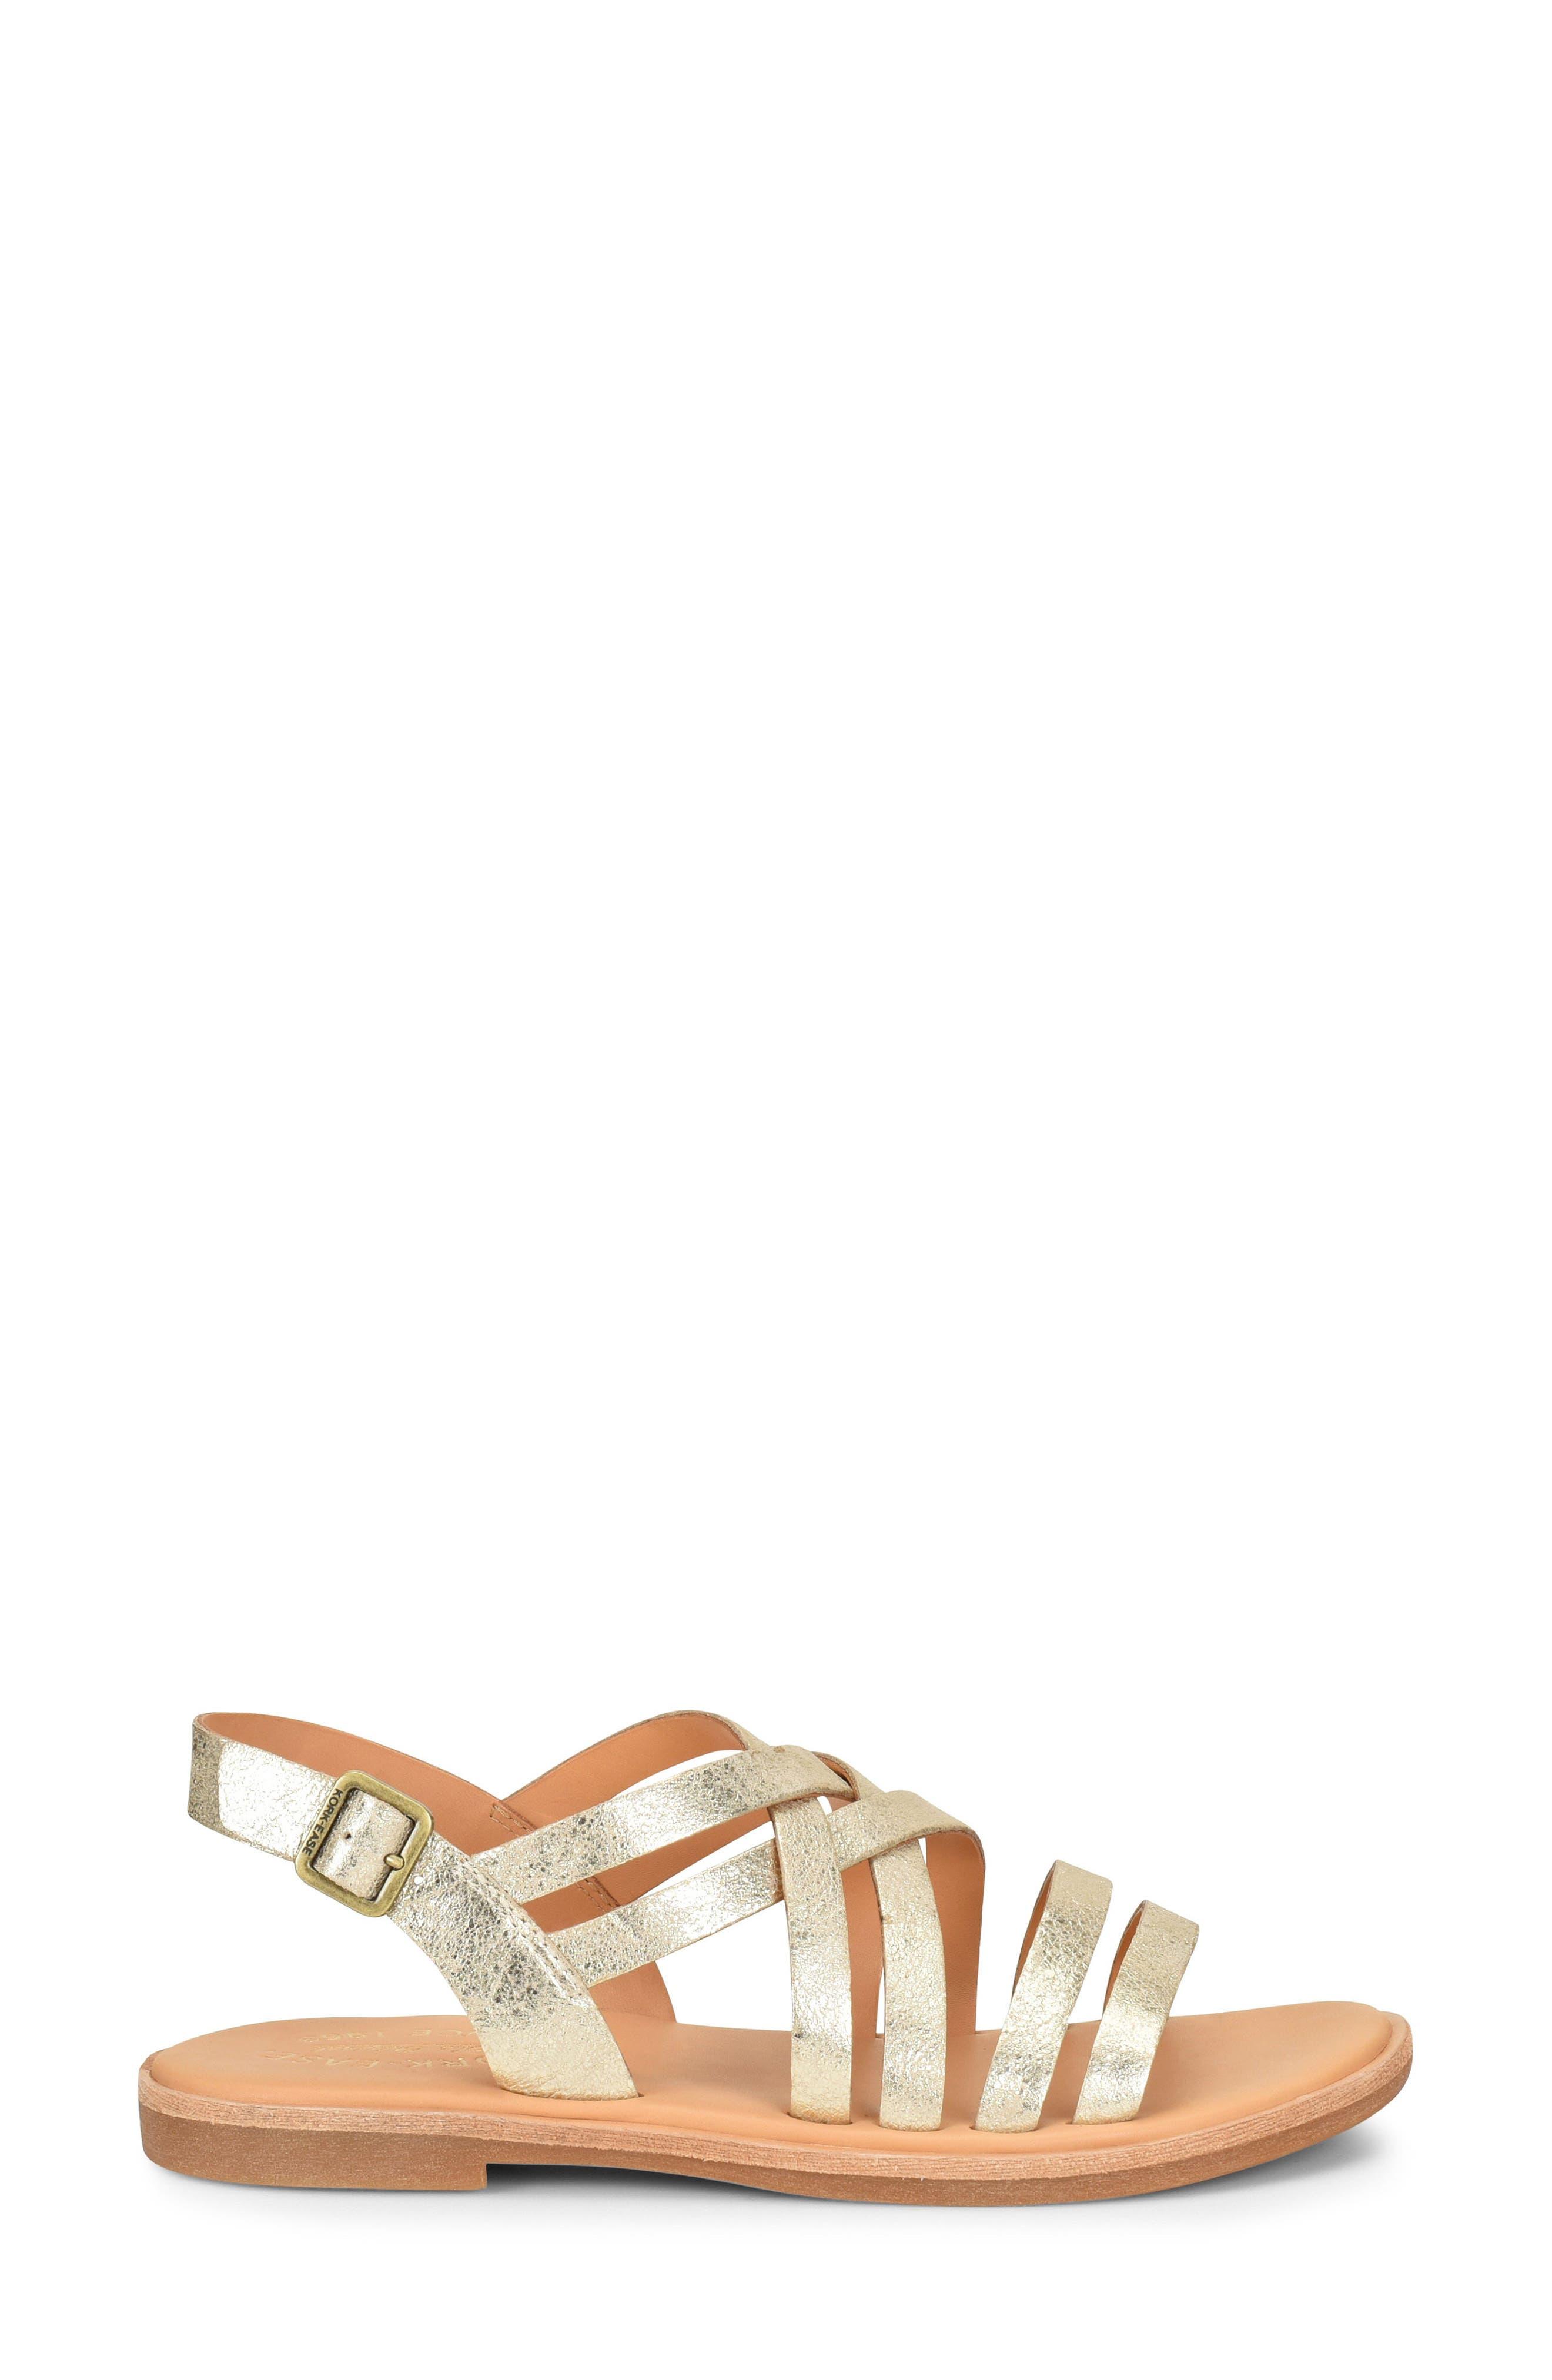 Nicobar Sandal,                             Alternate thumbnail 3, color,                             Gold Metallic Leather